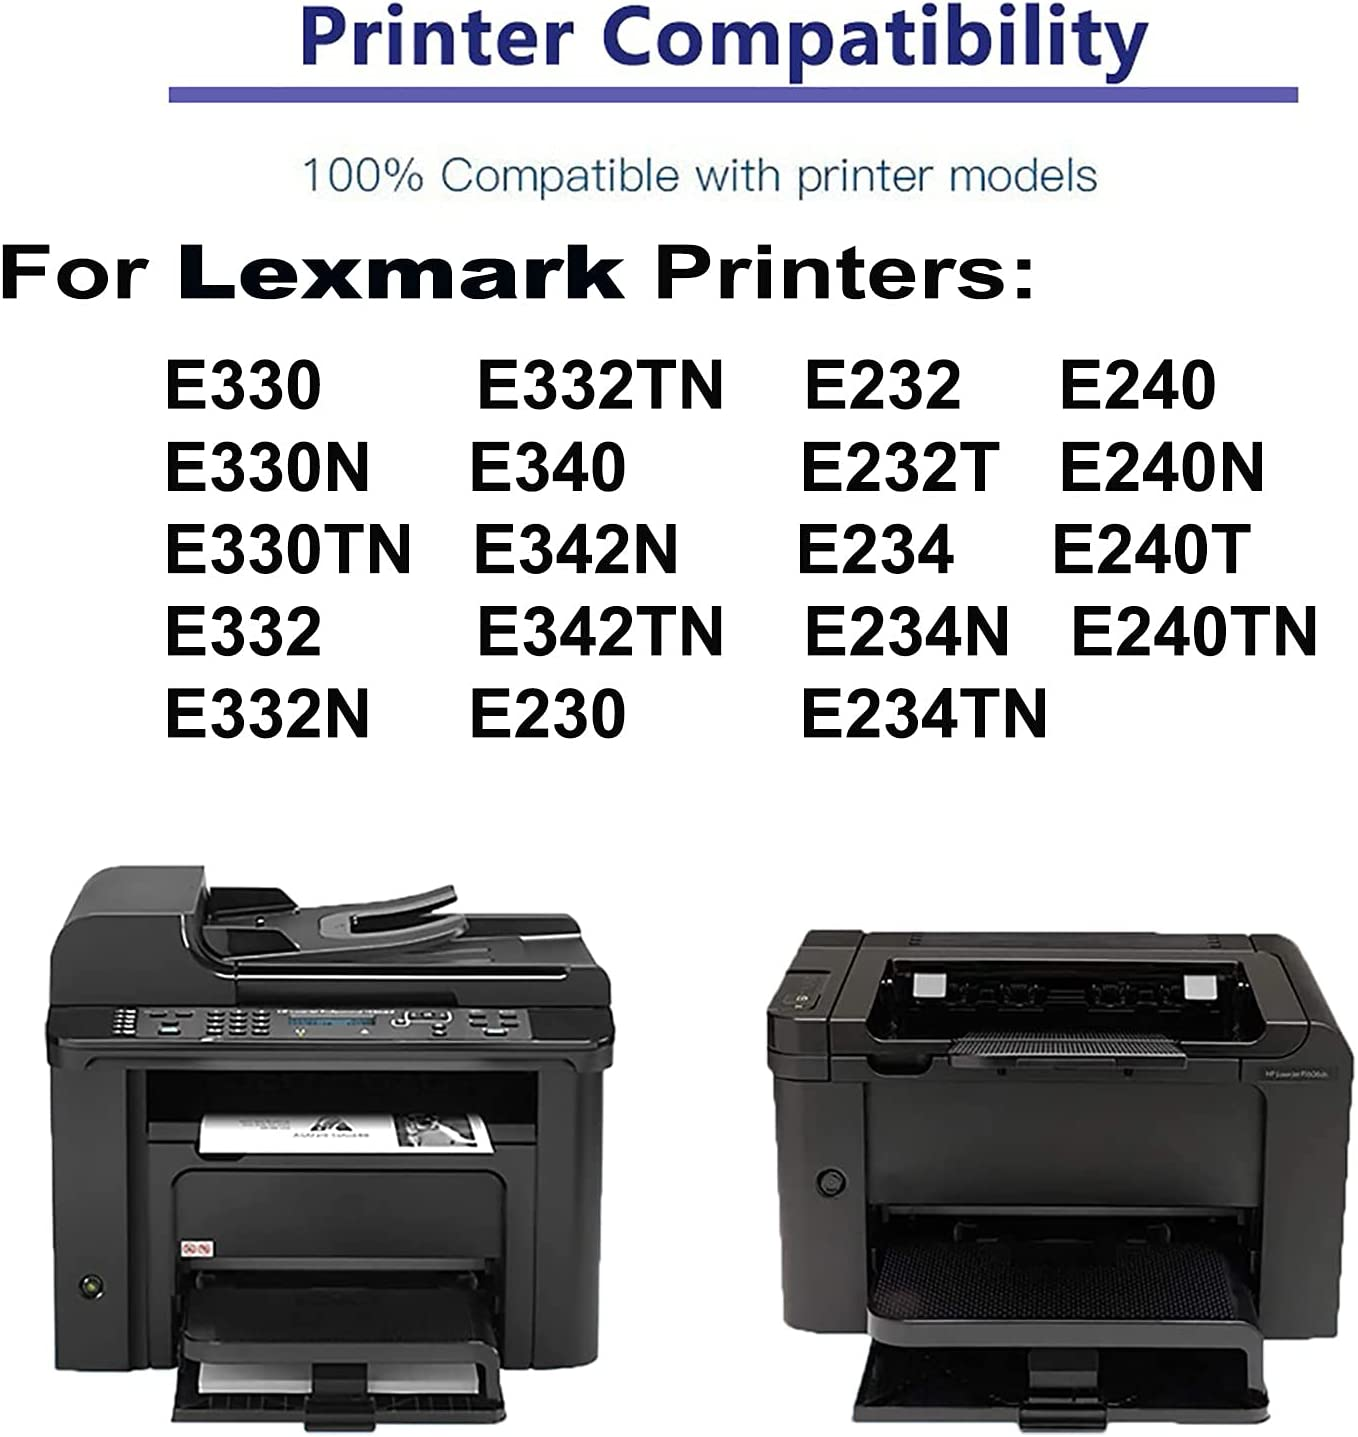 4-Pack Compatible High Yield E234N E234TN E240 E240N E240T E240TN Laser Printer Toner Cartridge Replacement for Lexmark 24035SA Printer Cartridge (Black)